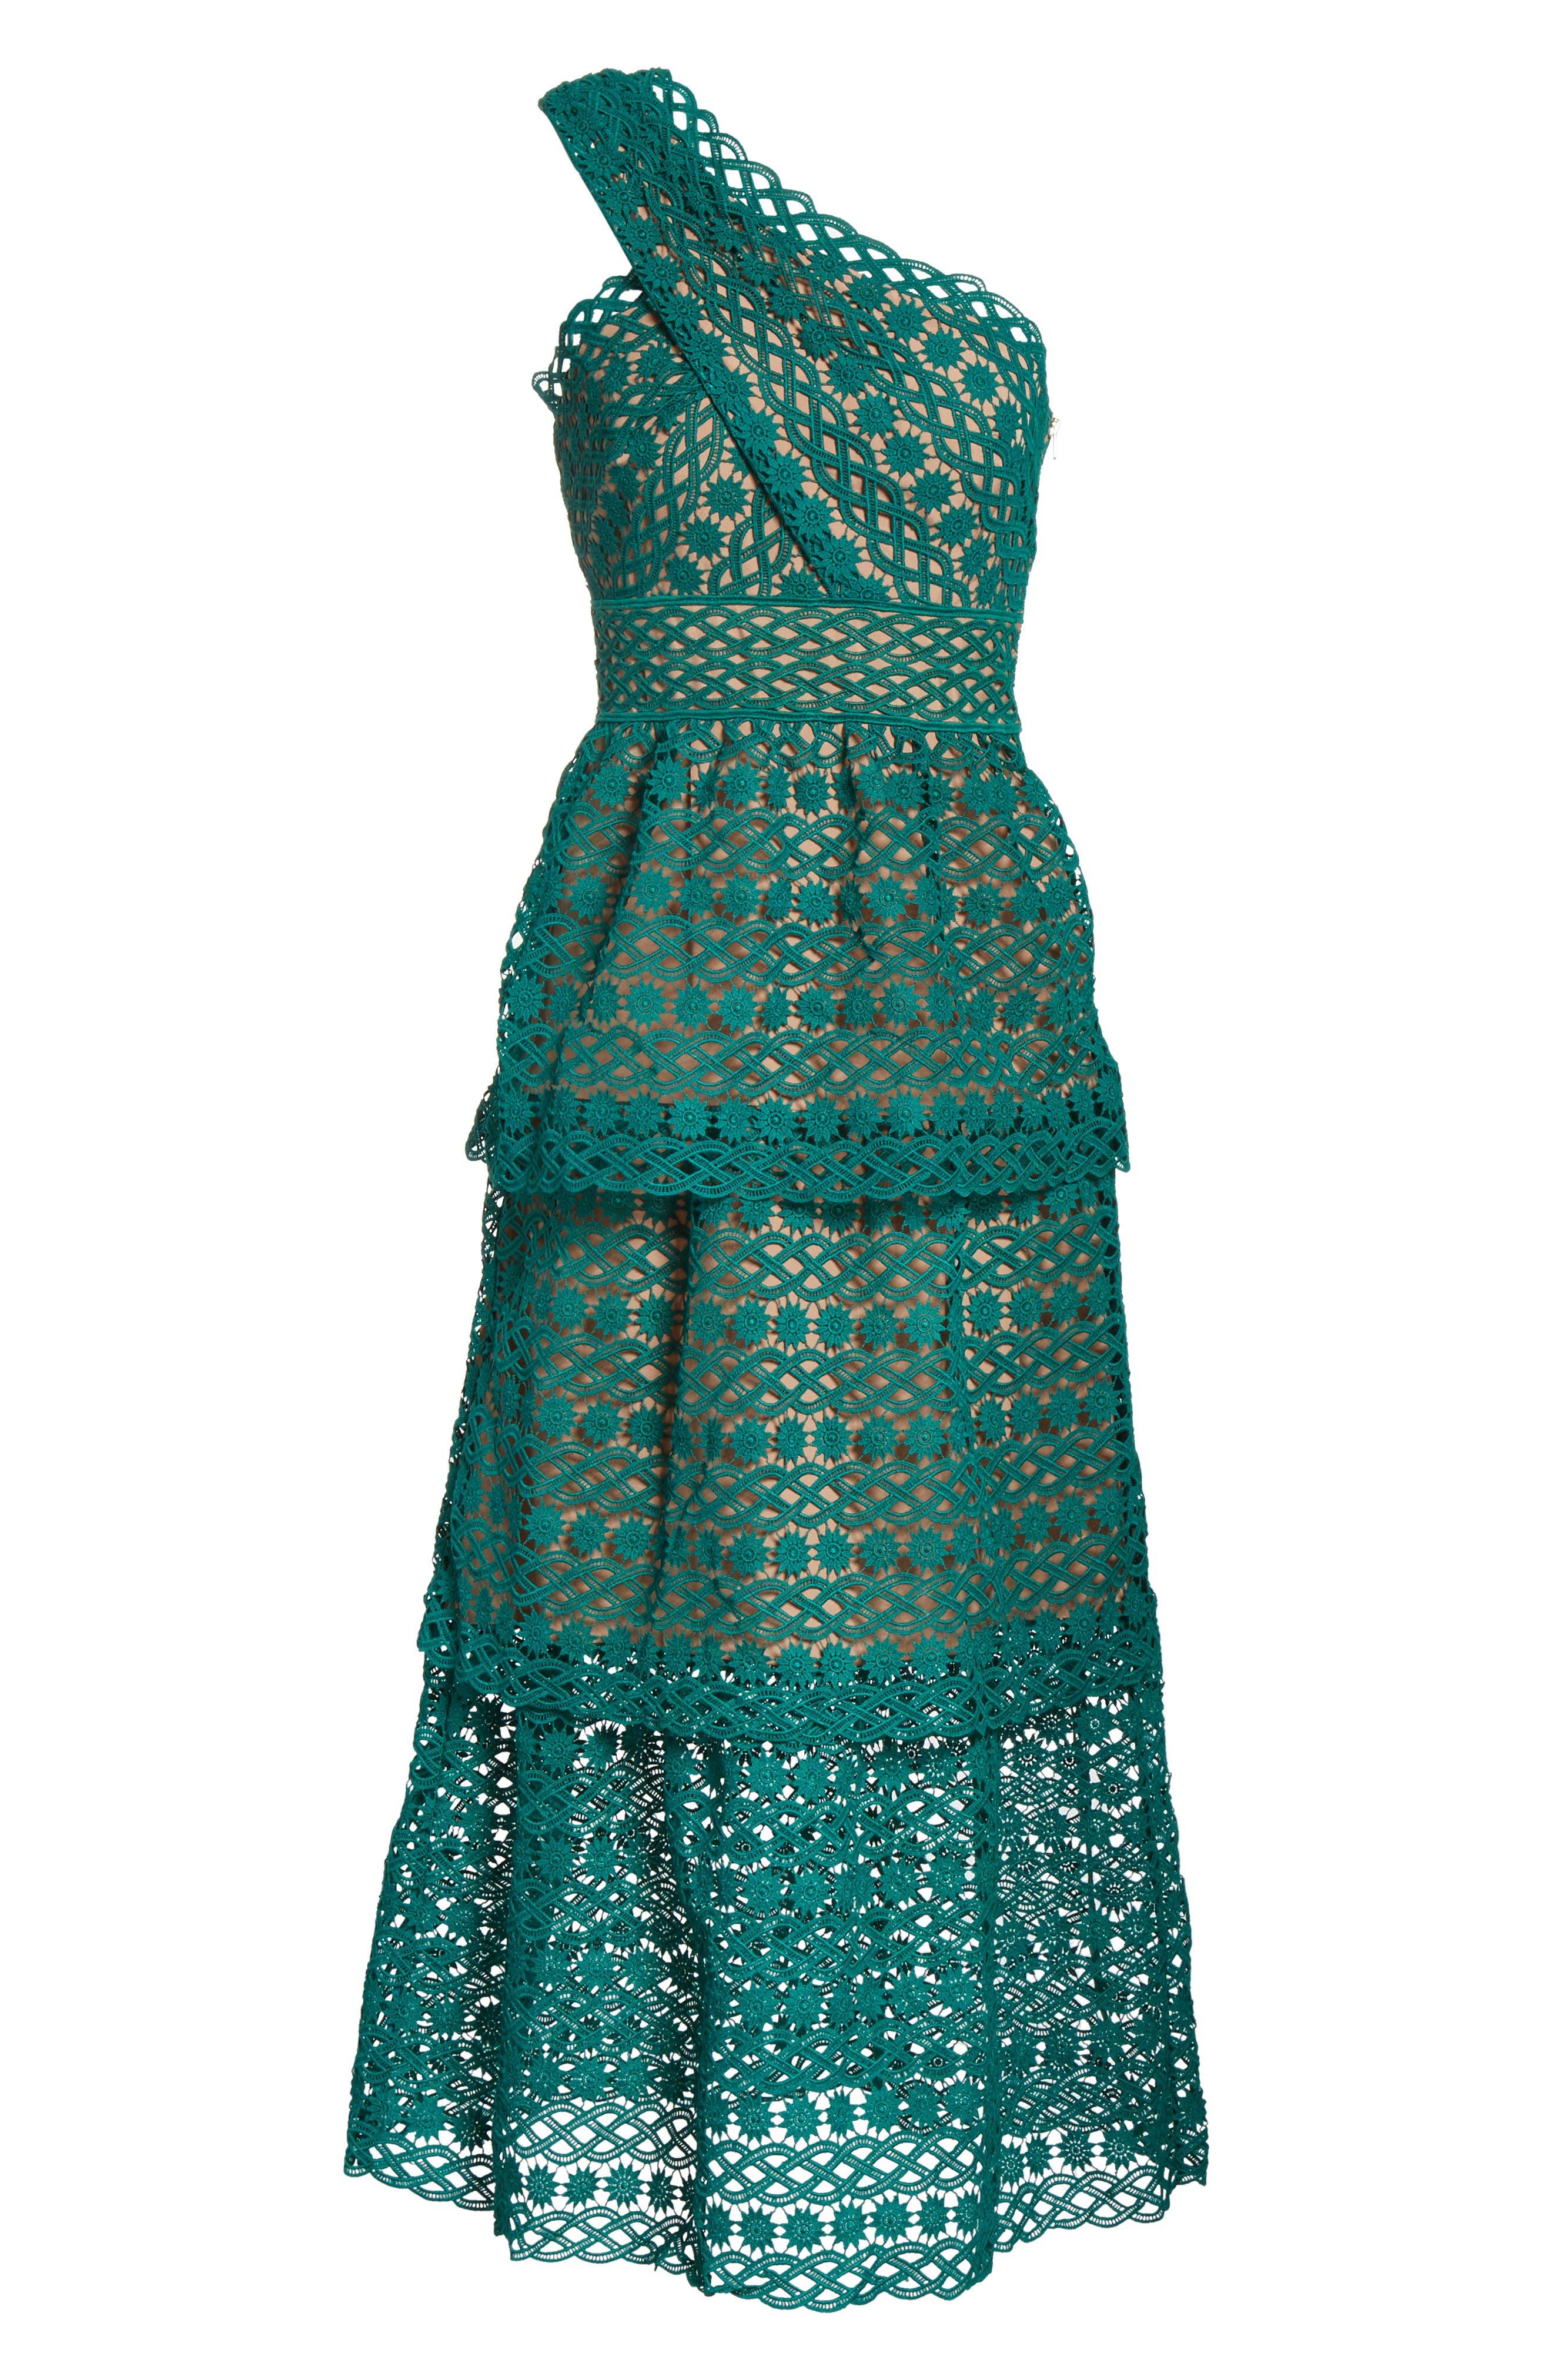 Lace One-Shoulder Midi Dress,                             Alternate thumbnail 6, color,                             300